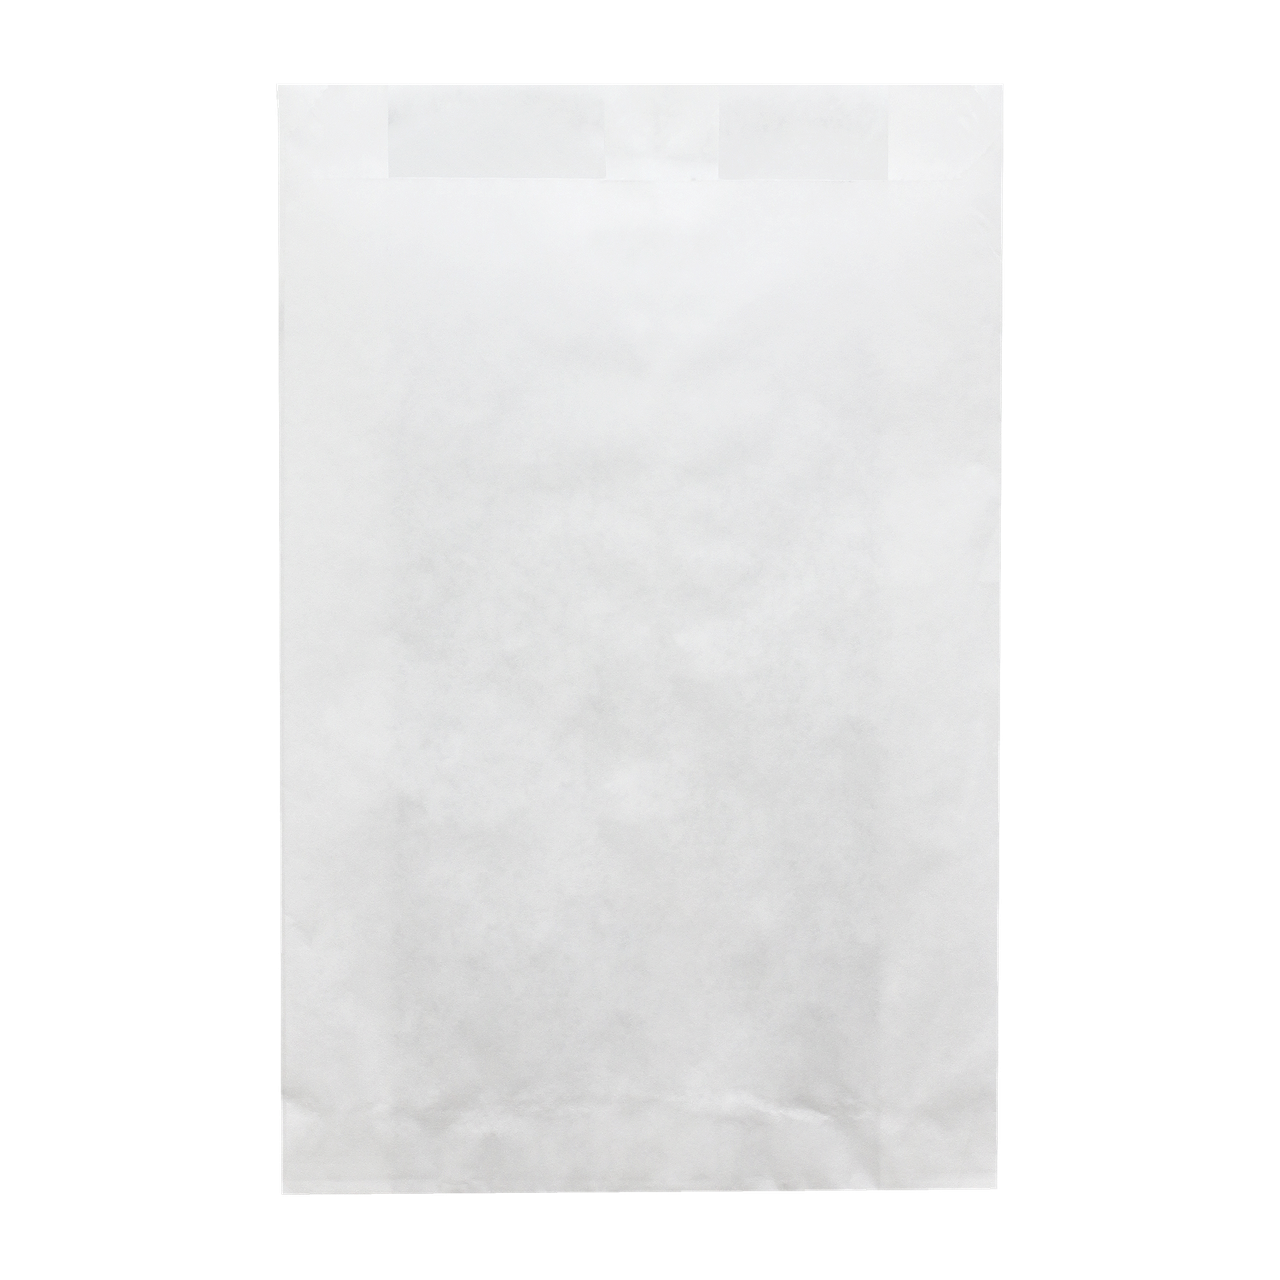 Пакет паперовий 240*120*50 100шт  Білий (242)